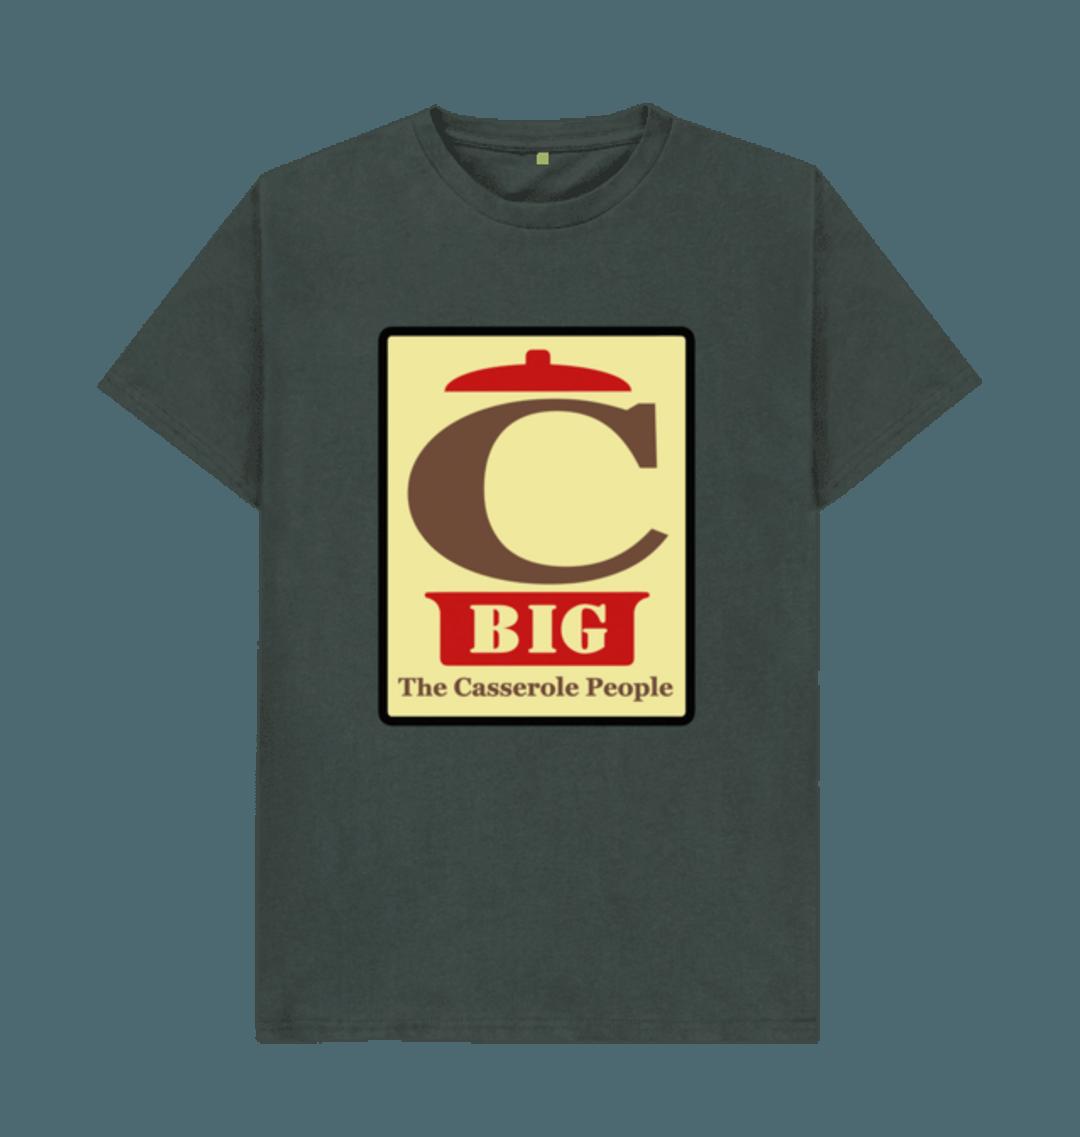 Big C The Casserole People Braw Tees Clothing